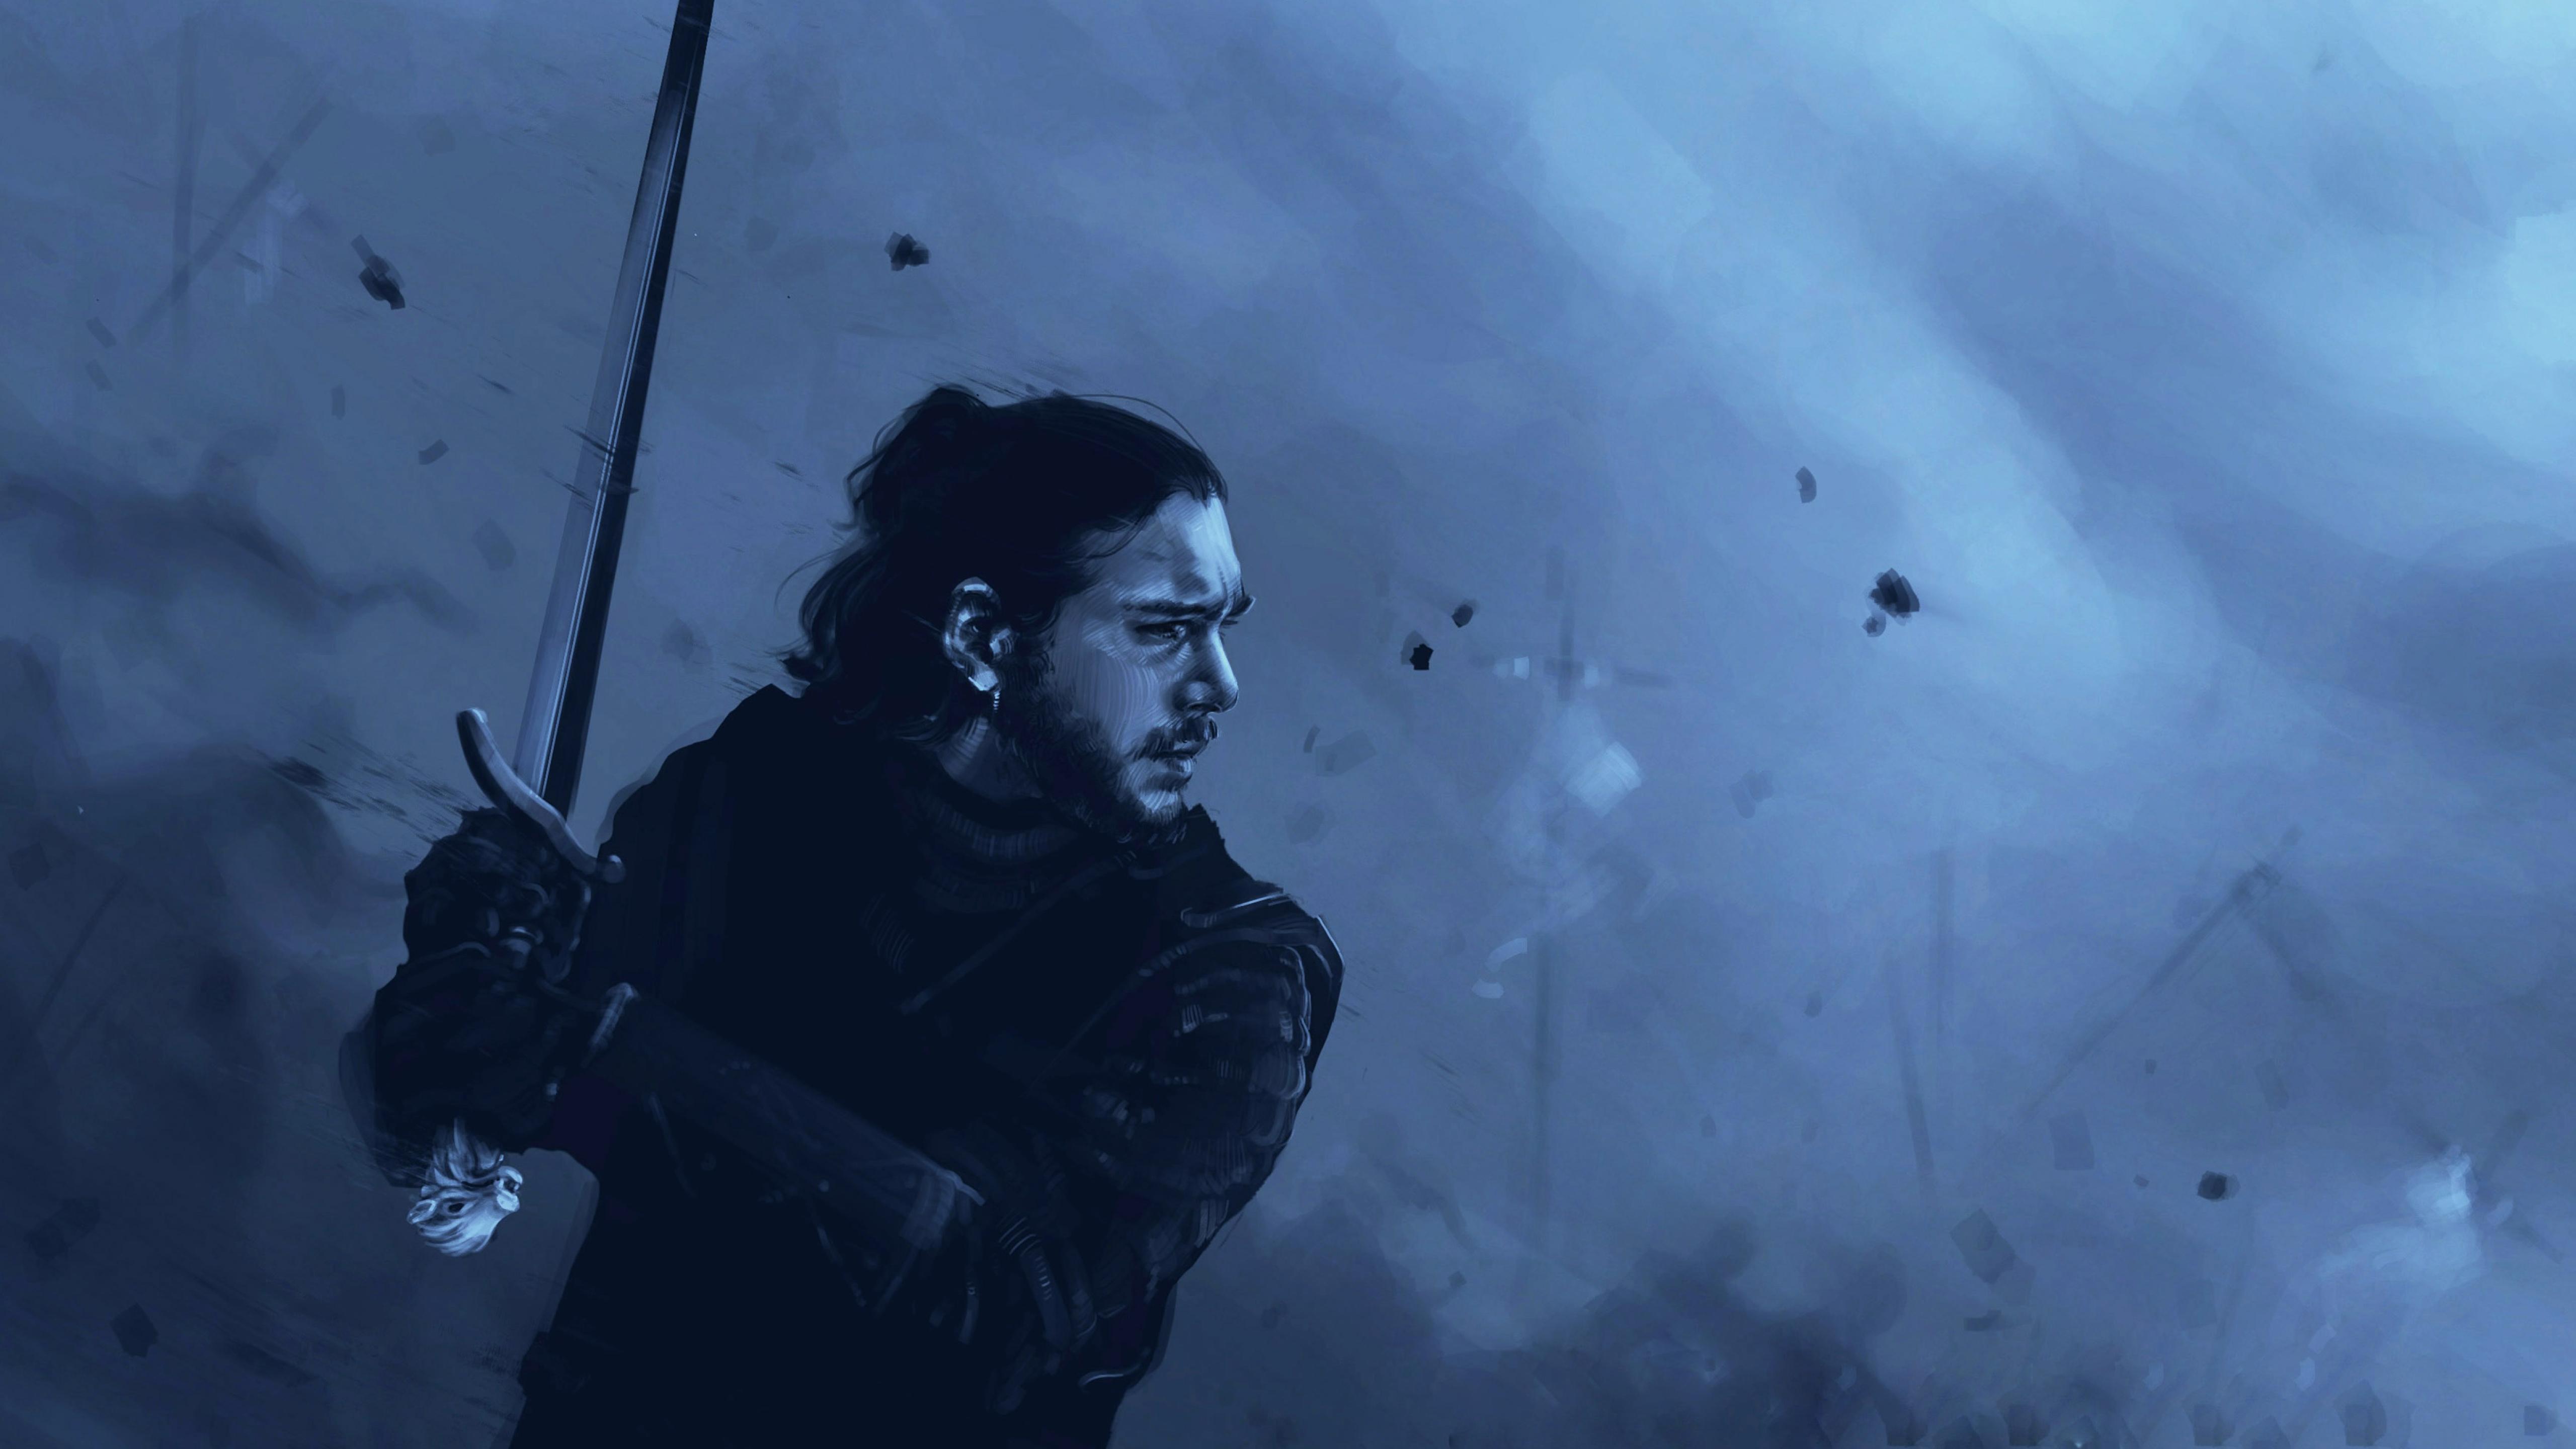 5120x2880 Jon Snow Game Of Thrones Art 5k Wallpaper Hd Tv Series